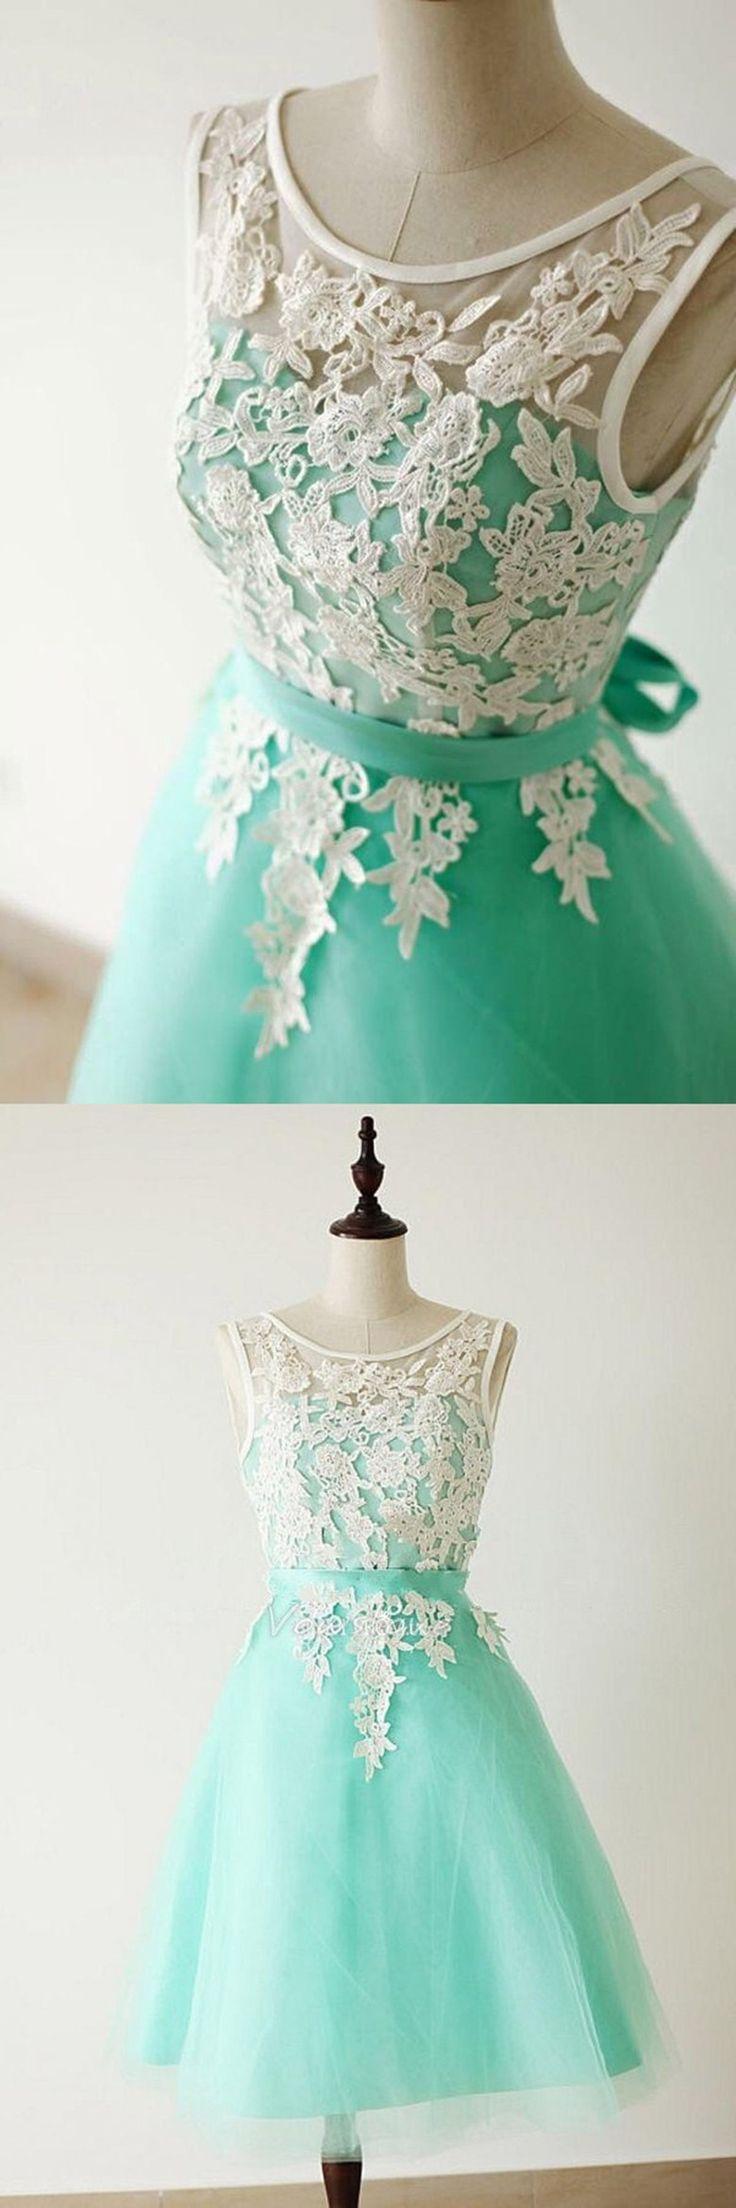 Homecoming dress,short homecoming dress,mint homecoming dress,homecoming dress…